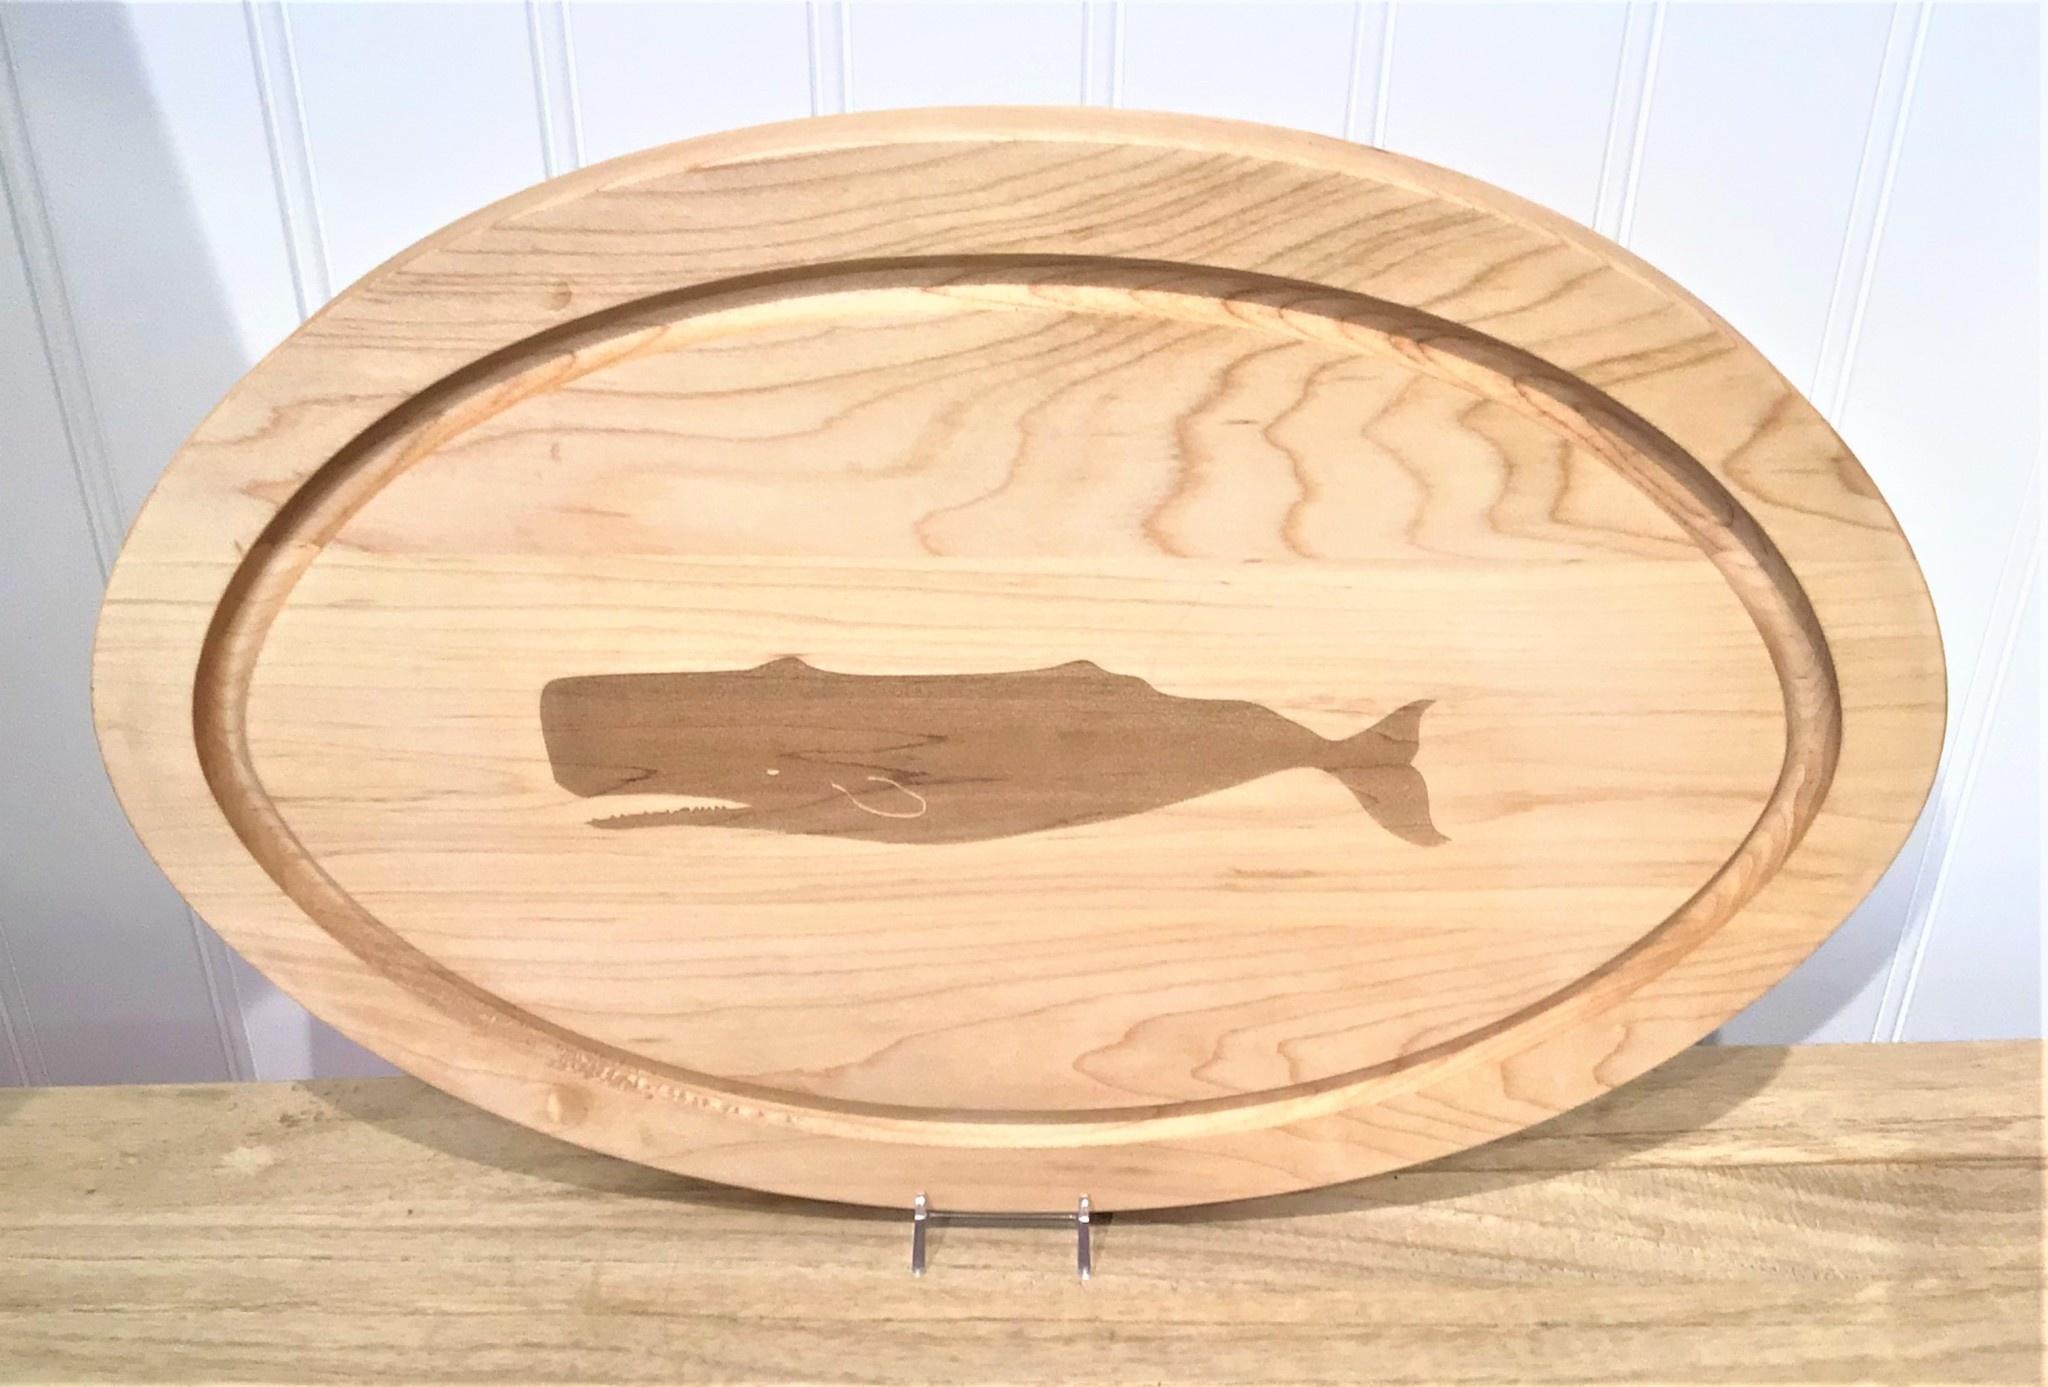 Whale 18x12 Medium Oval Board No Handles